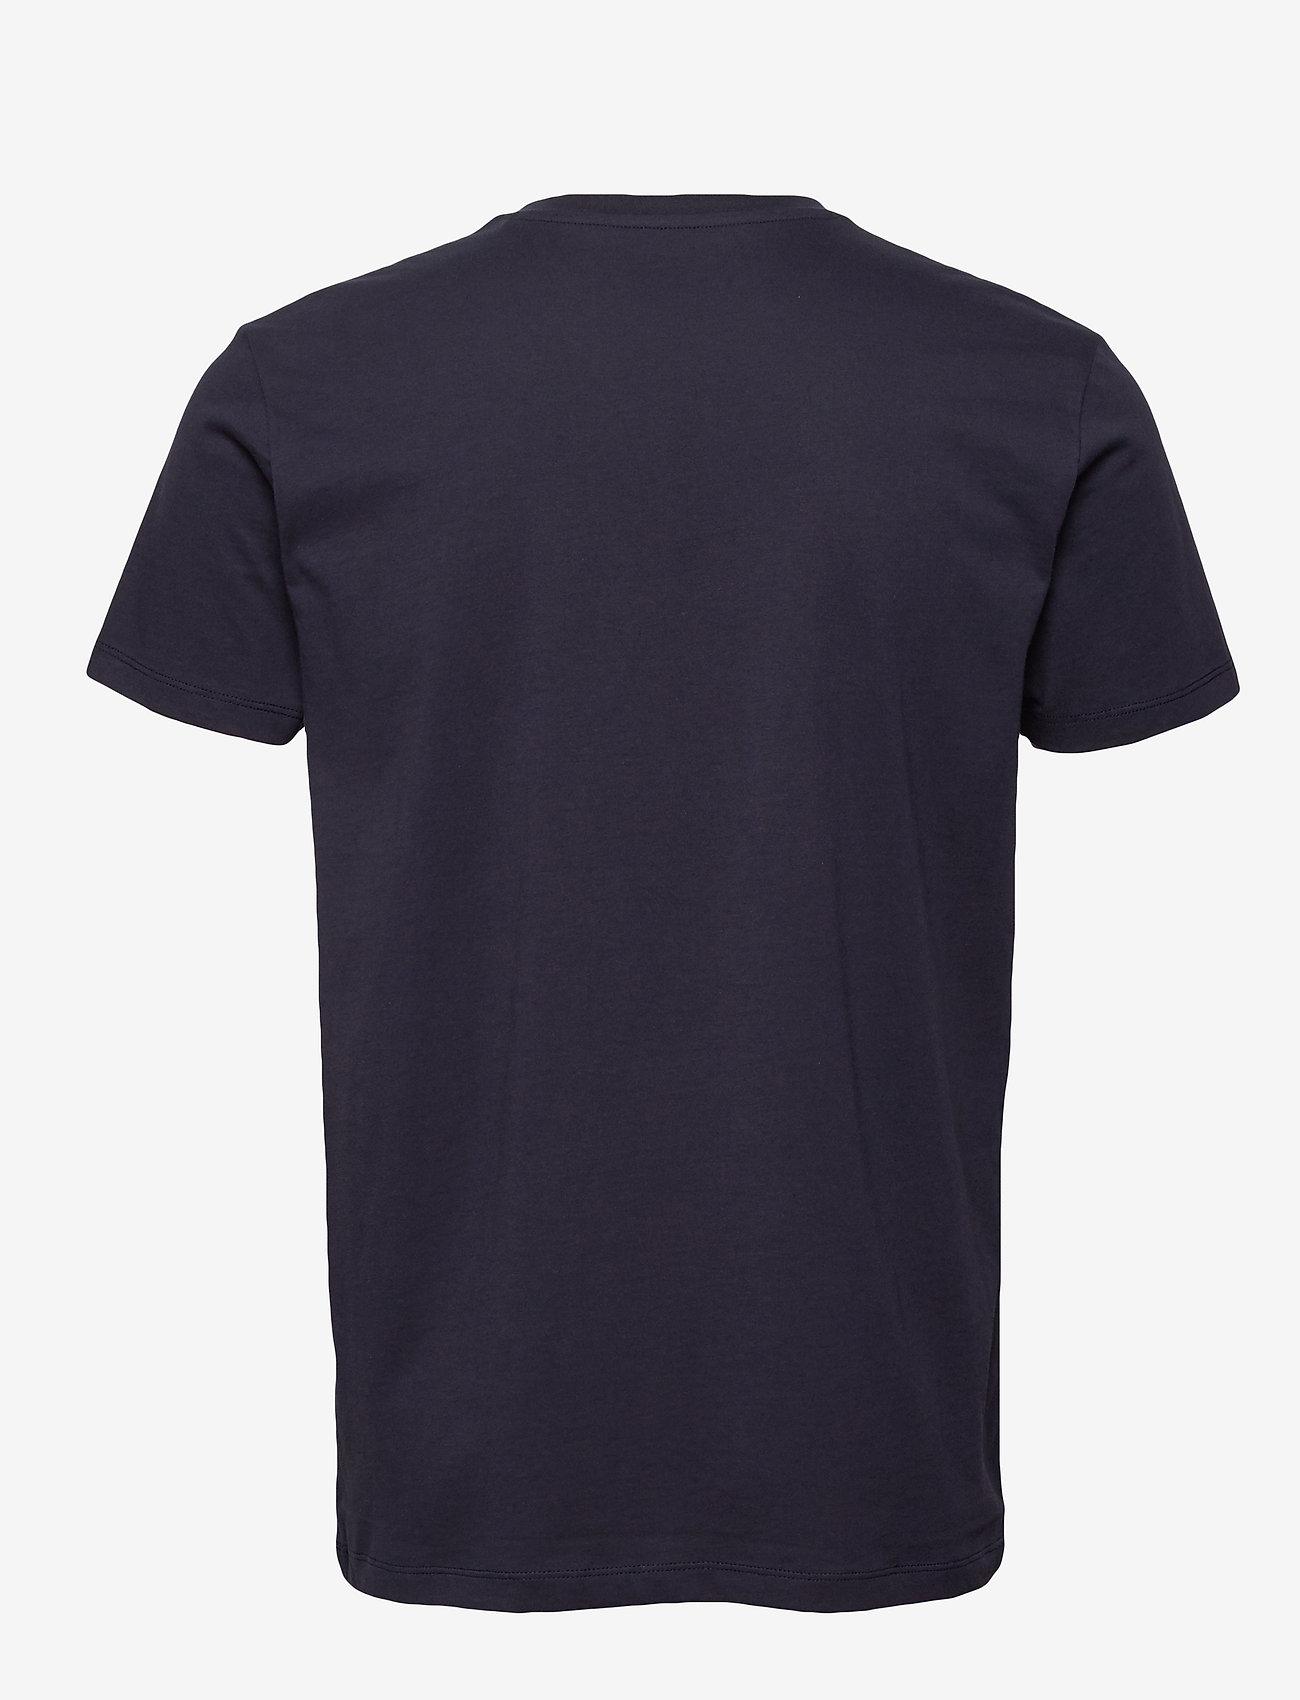 Esprit Casual - T-Shirts - basic t-shirts - navy - 1